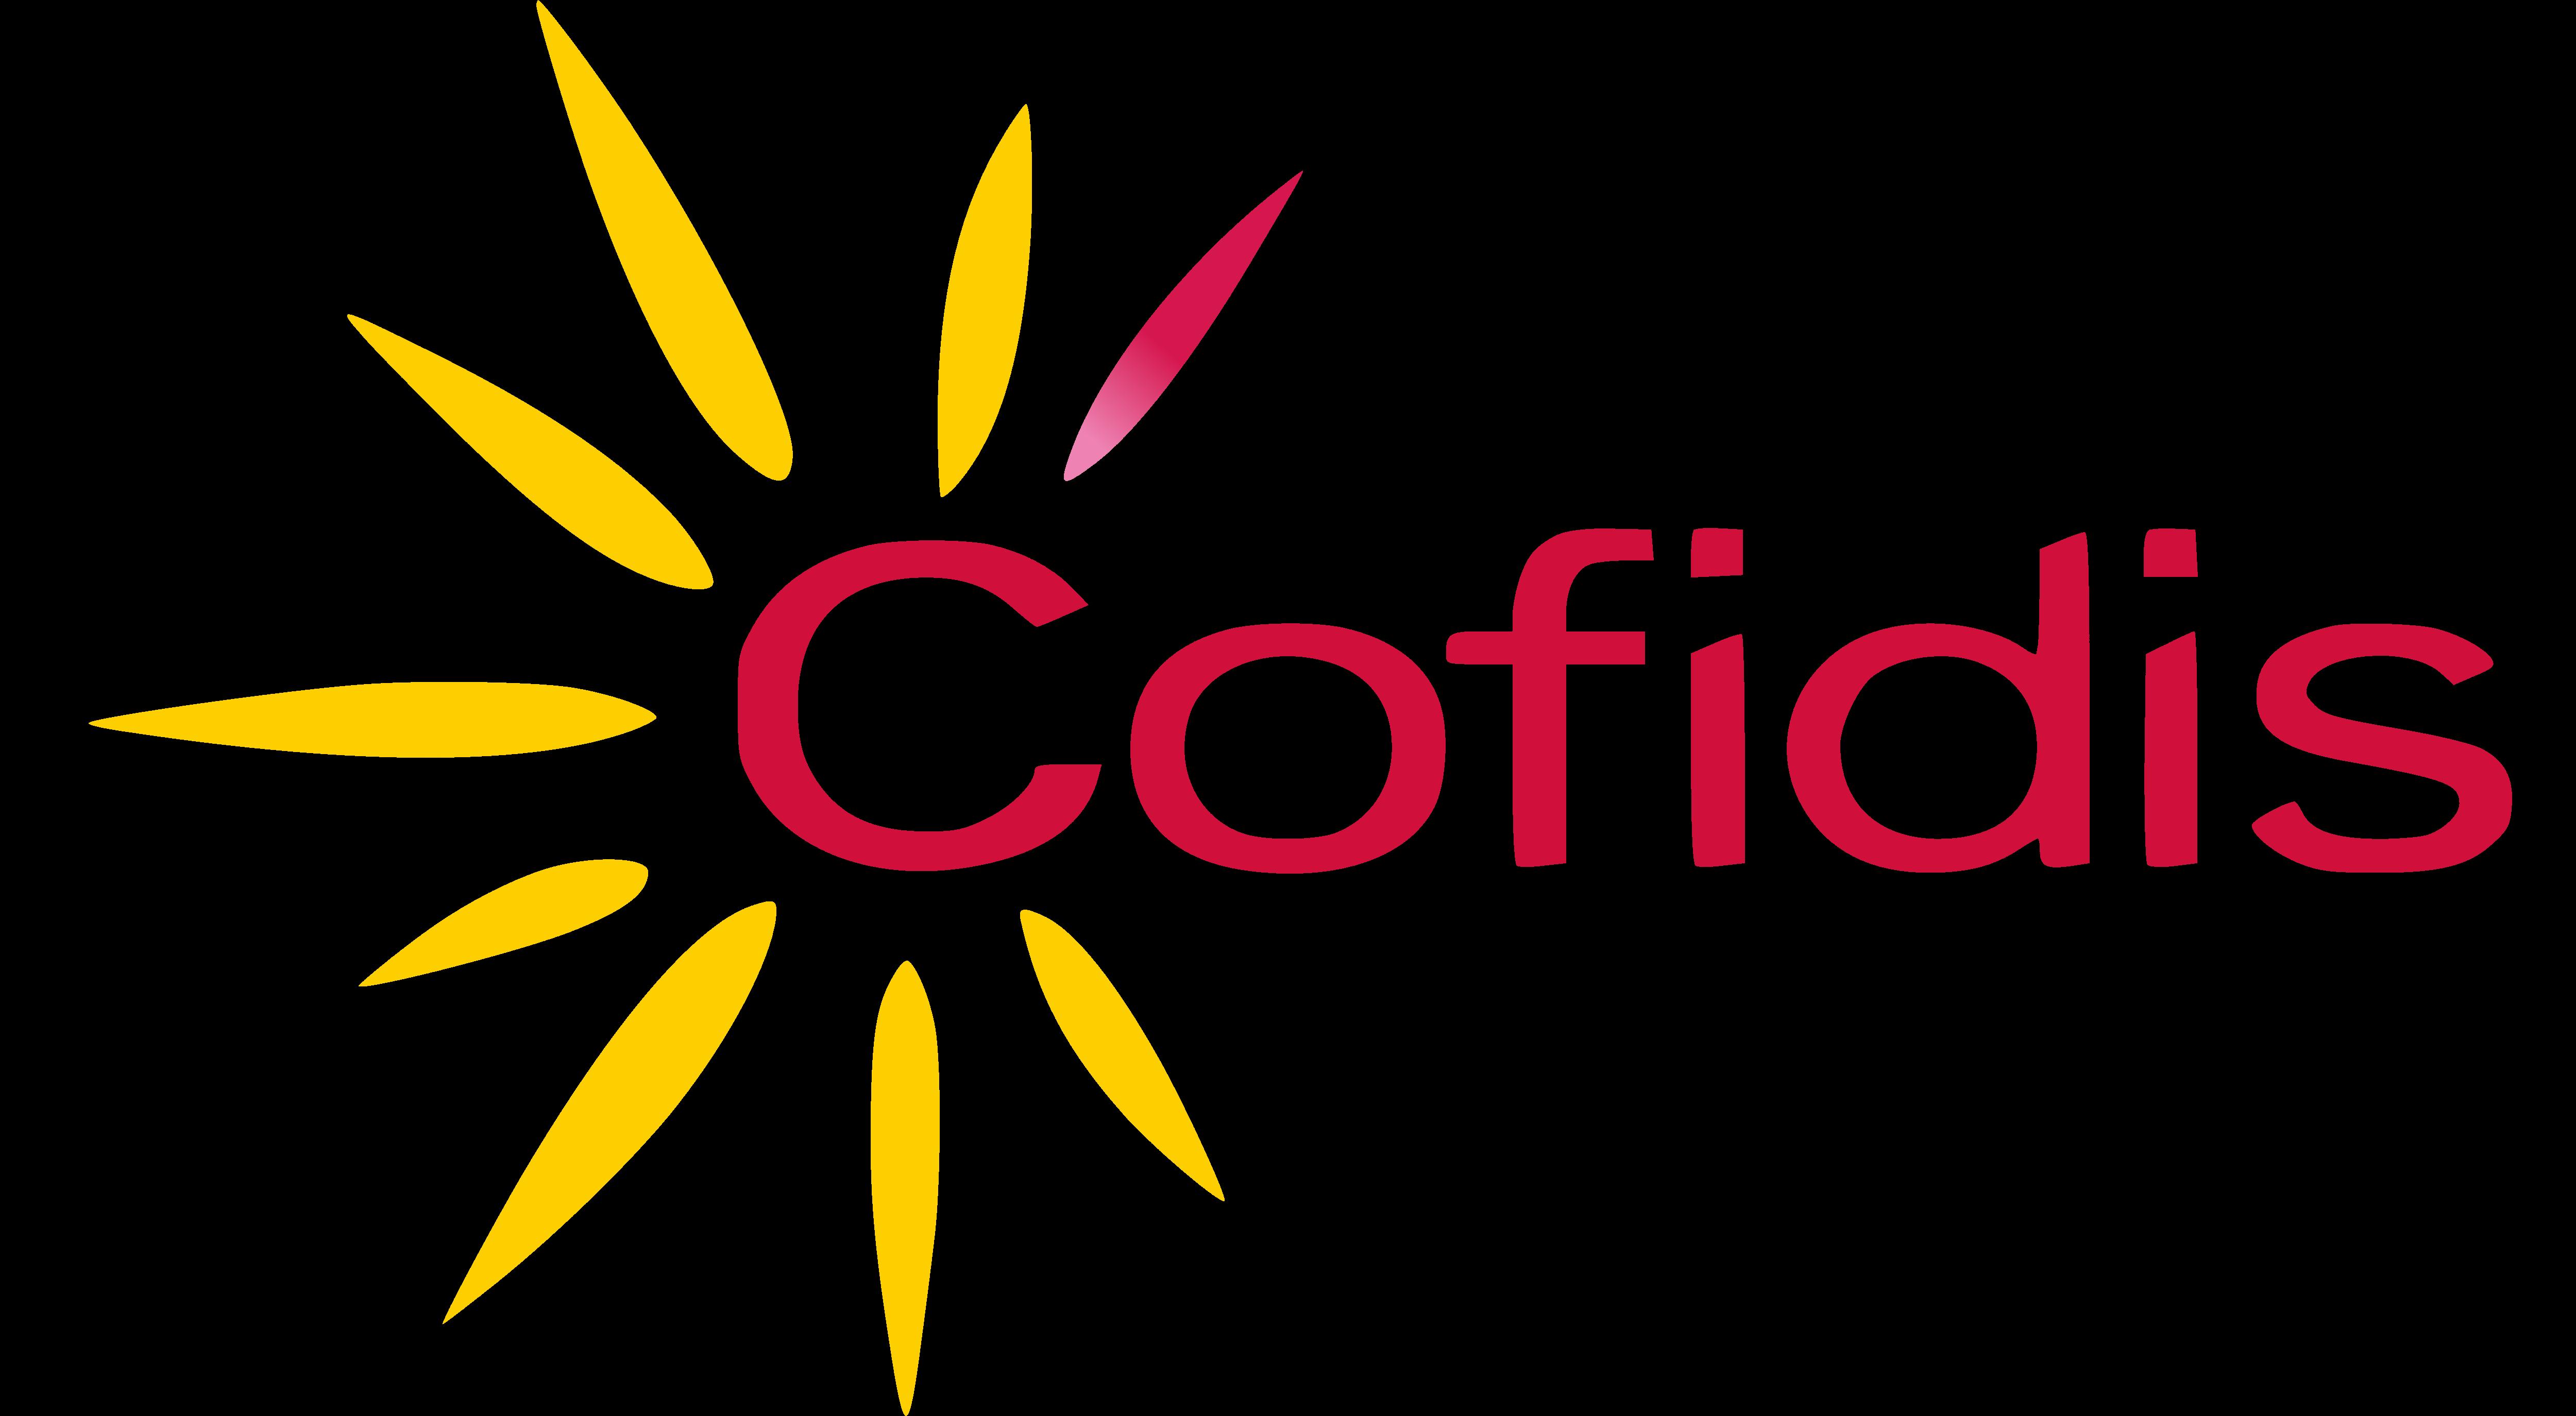 Cofidis Logos Download